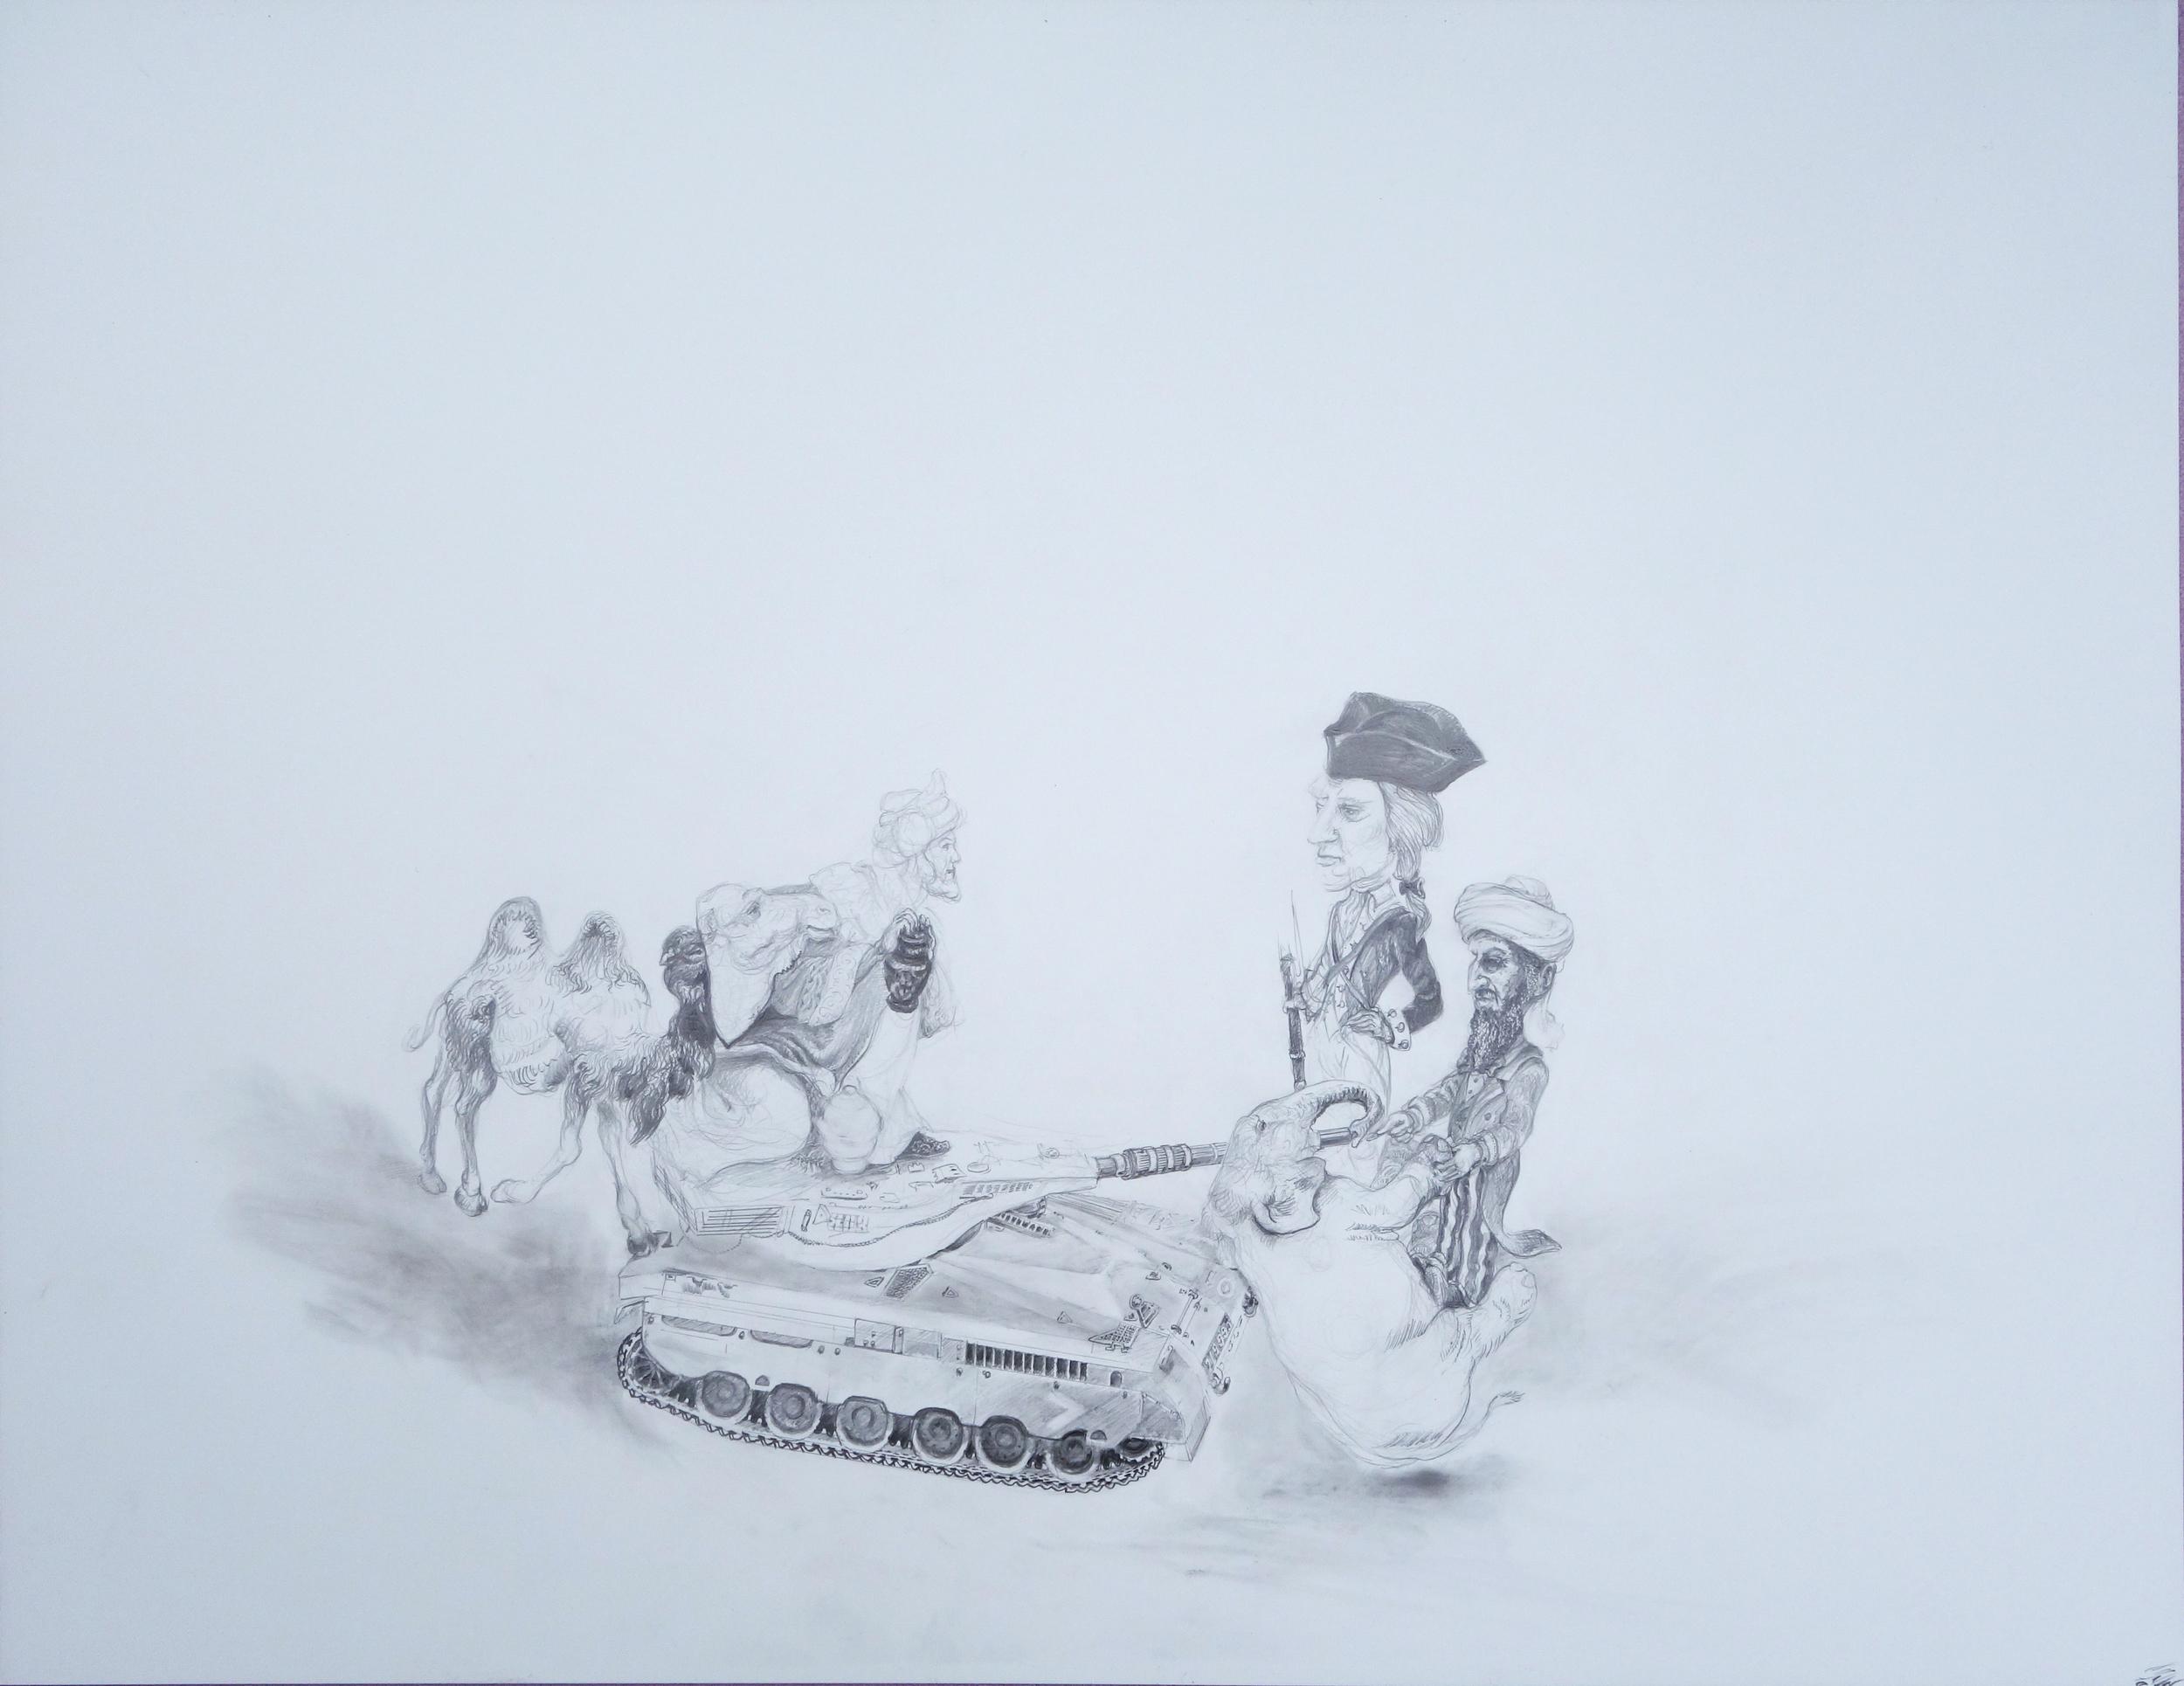 Untitled (Tank)